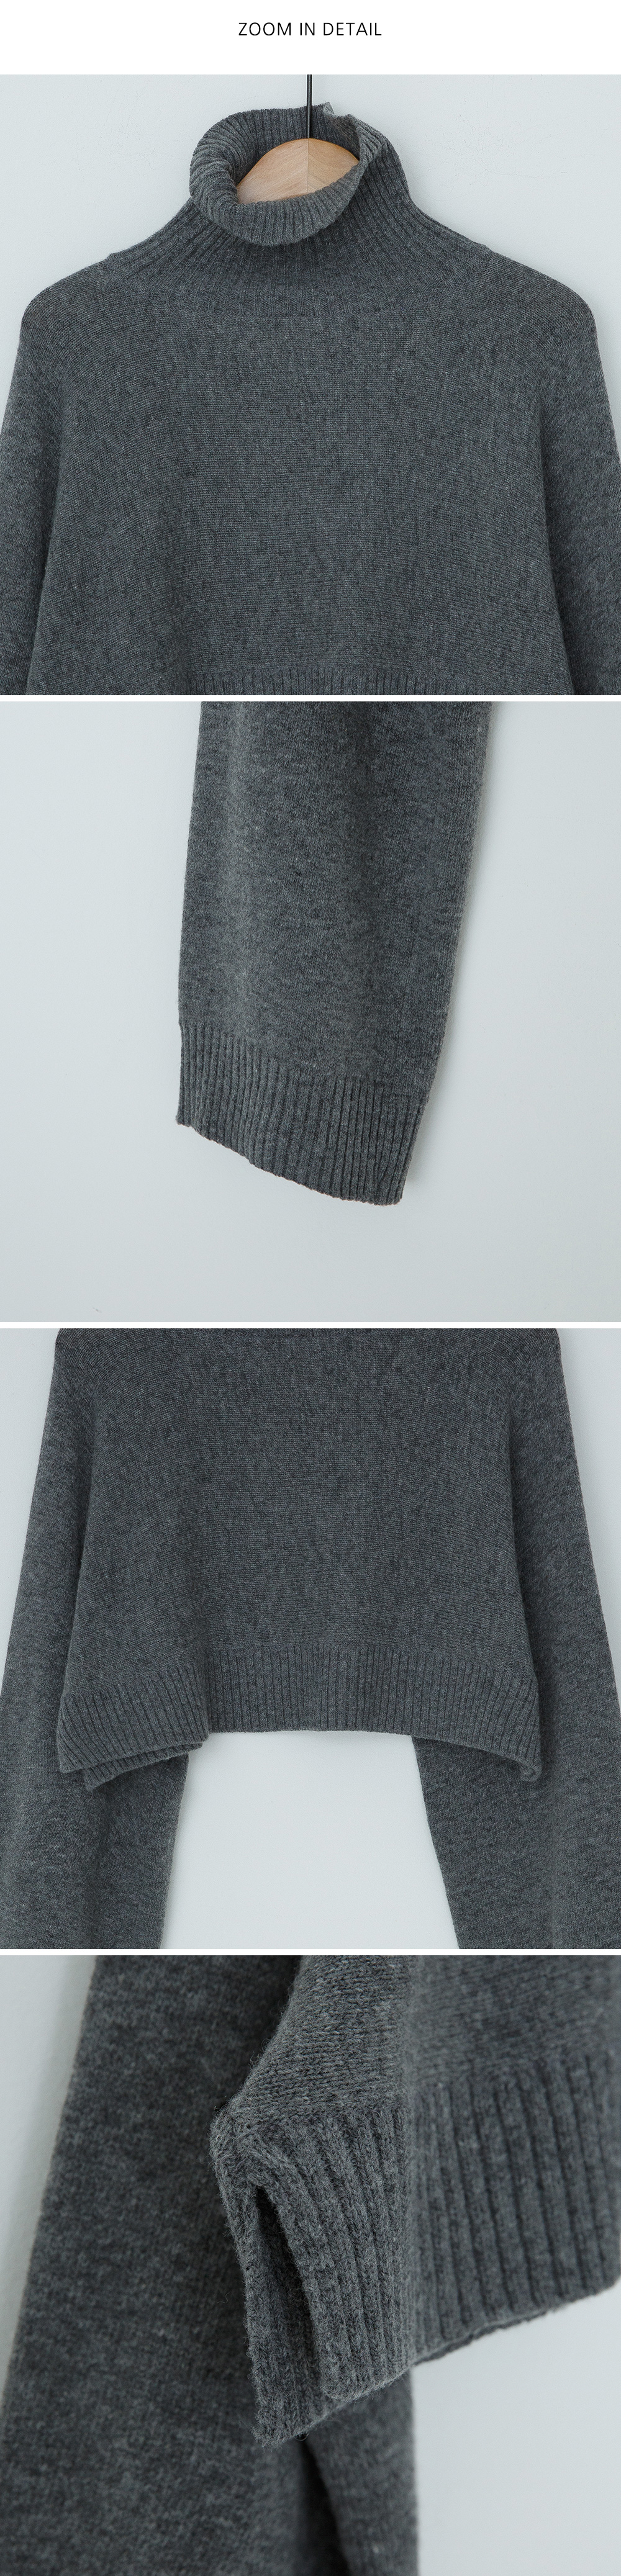 Viva turtleneck crop wool knit